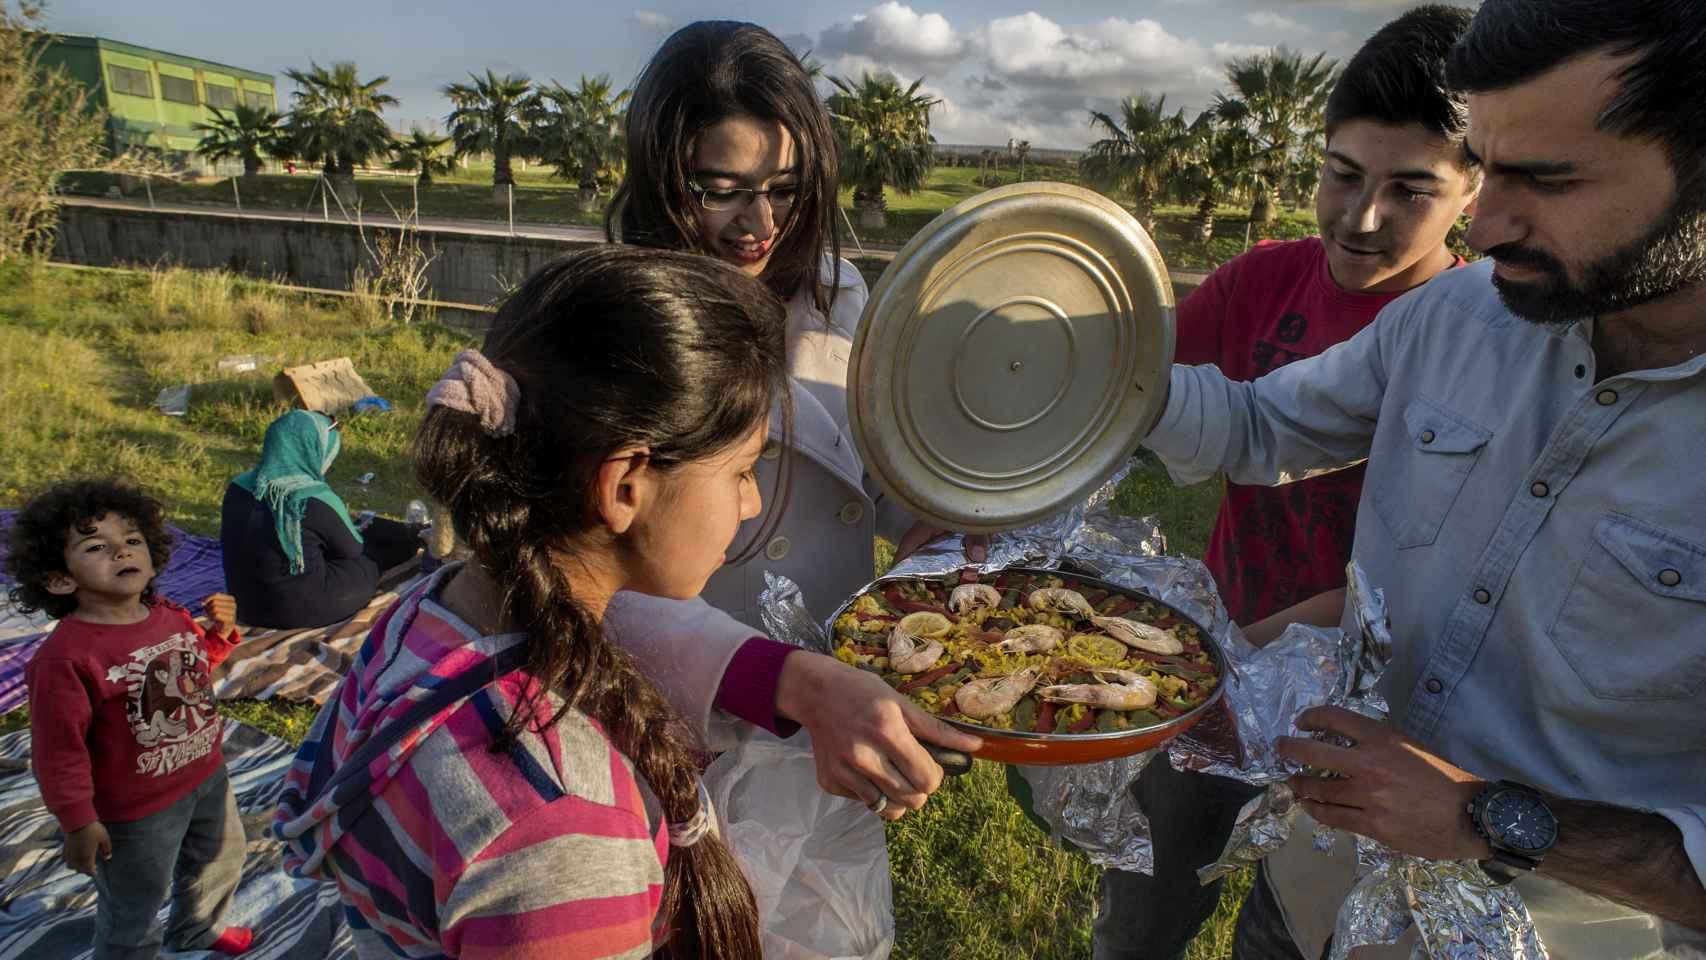 Lamya y Saleh, junto a la familia, preparando una paella.